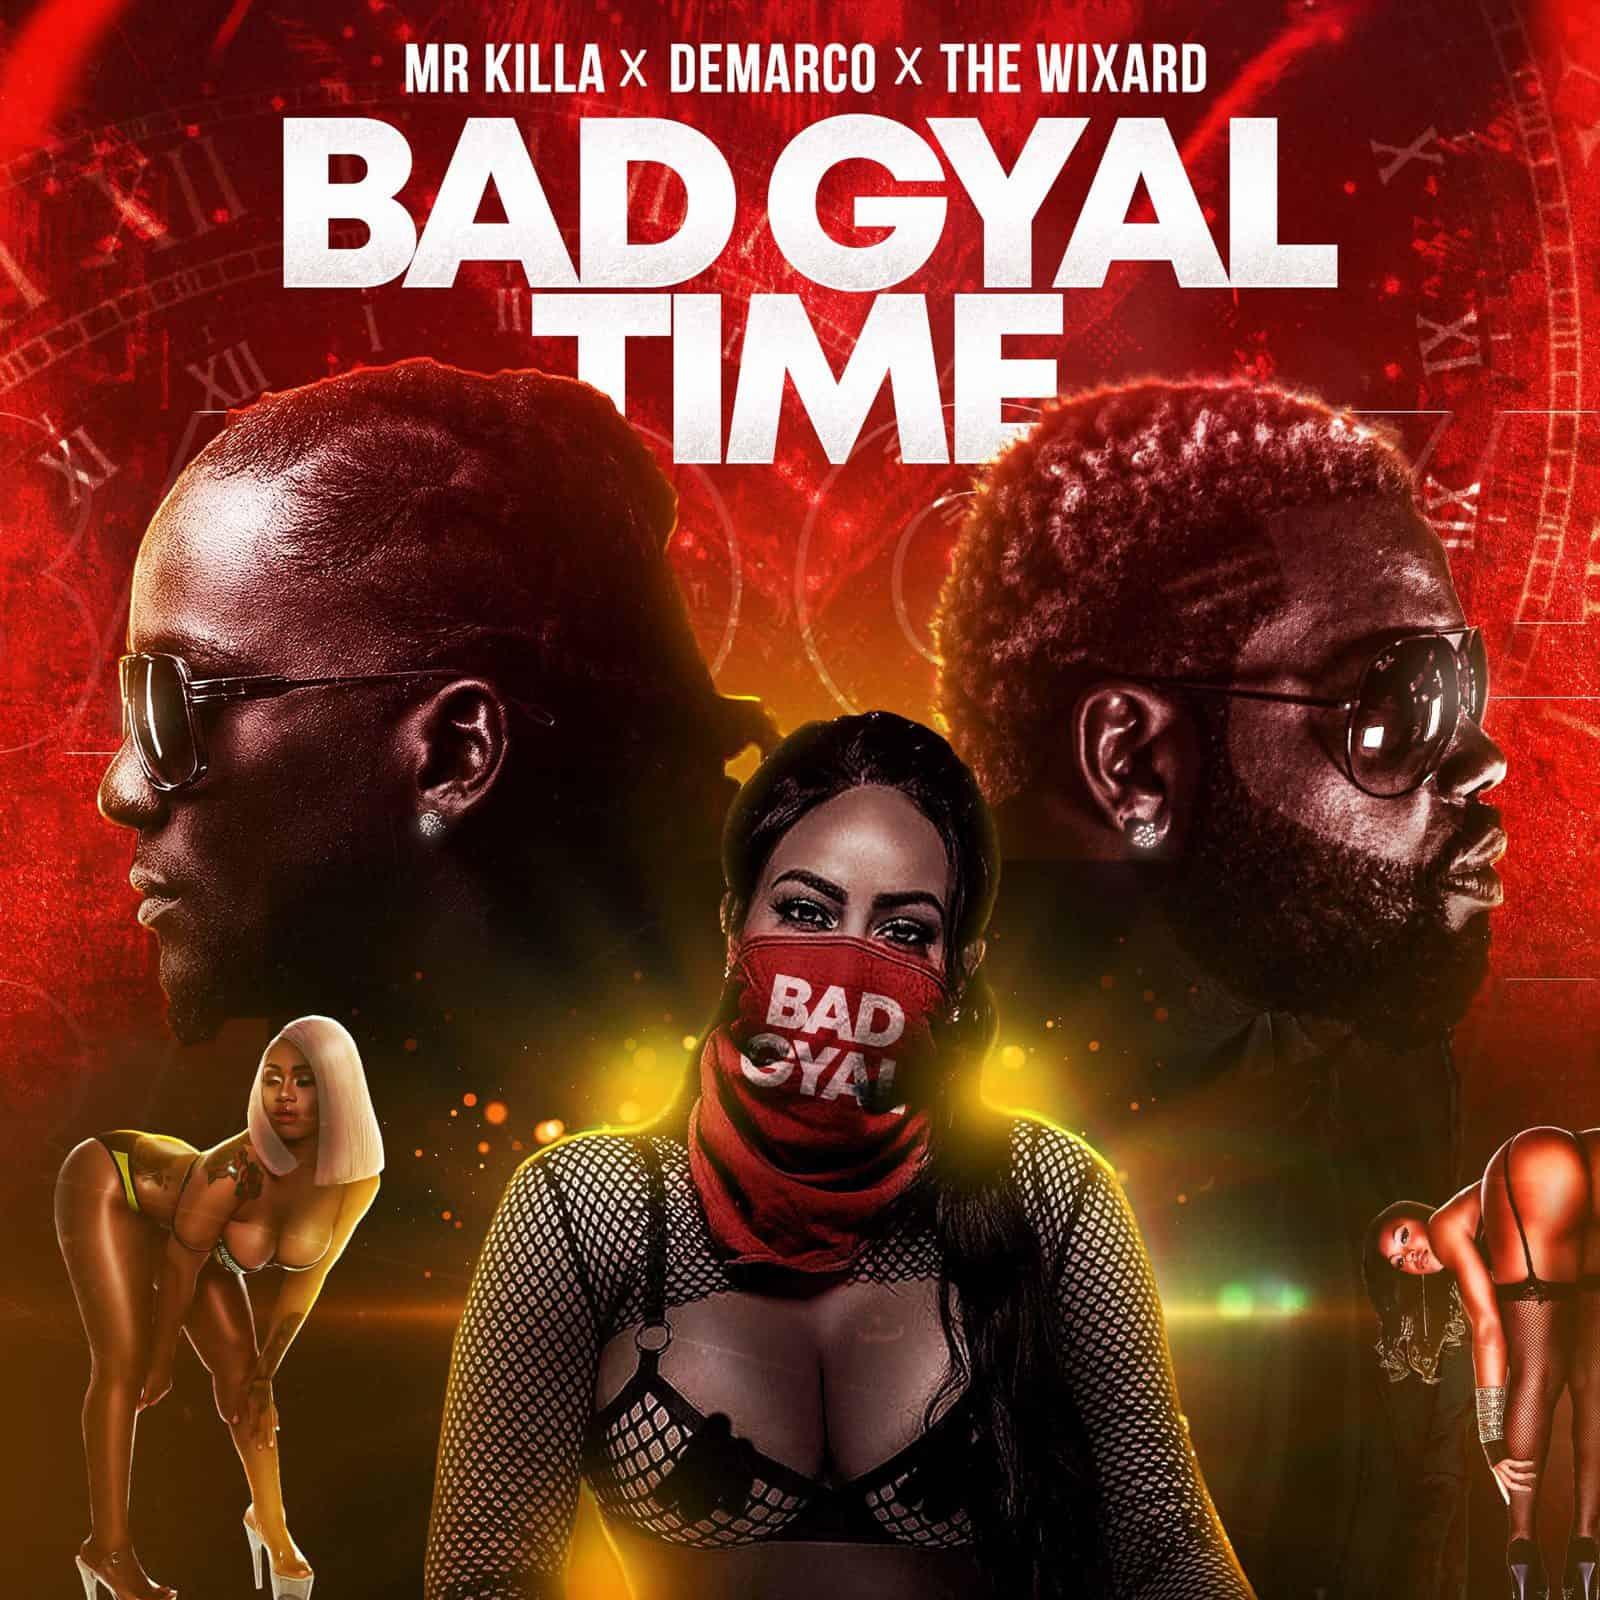 Bad Gyal Time - Mr Killa x Demarco x The Wixard